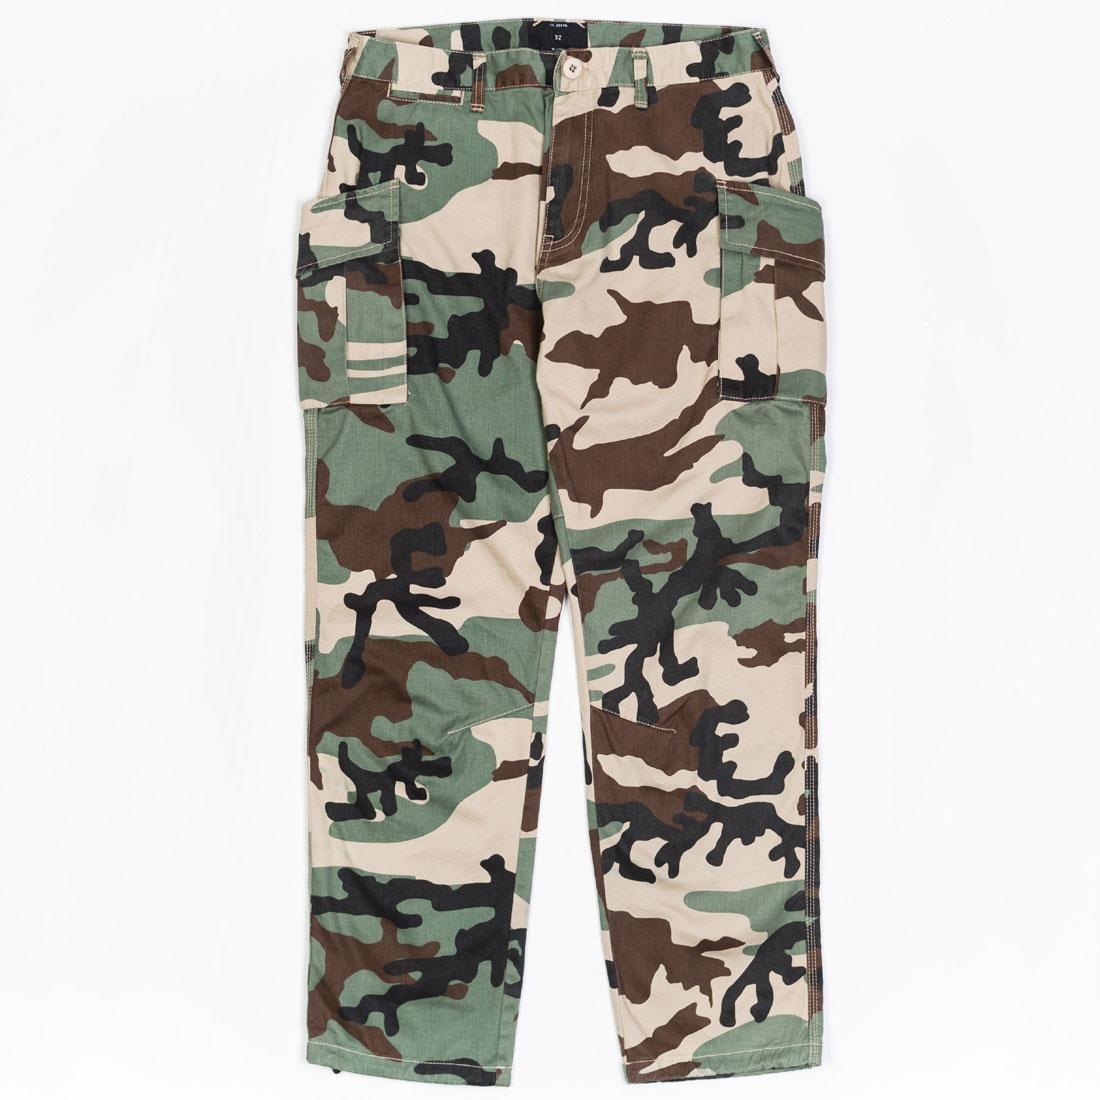 10 Deep Men Alpha Charlie Cargo Pants (camo / woodland)